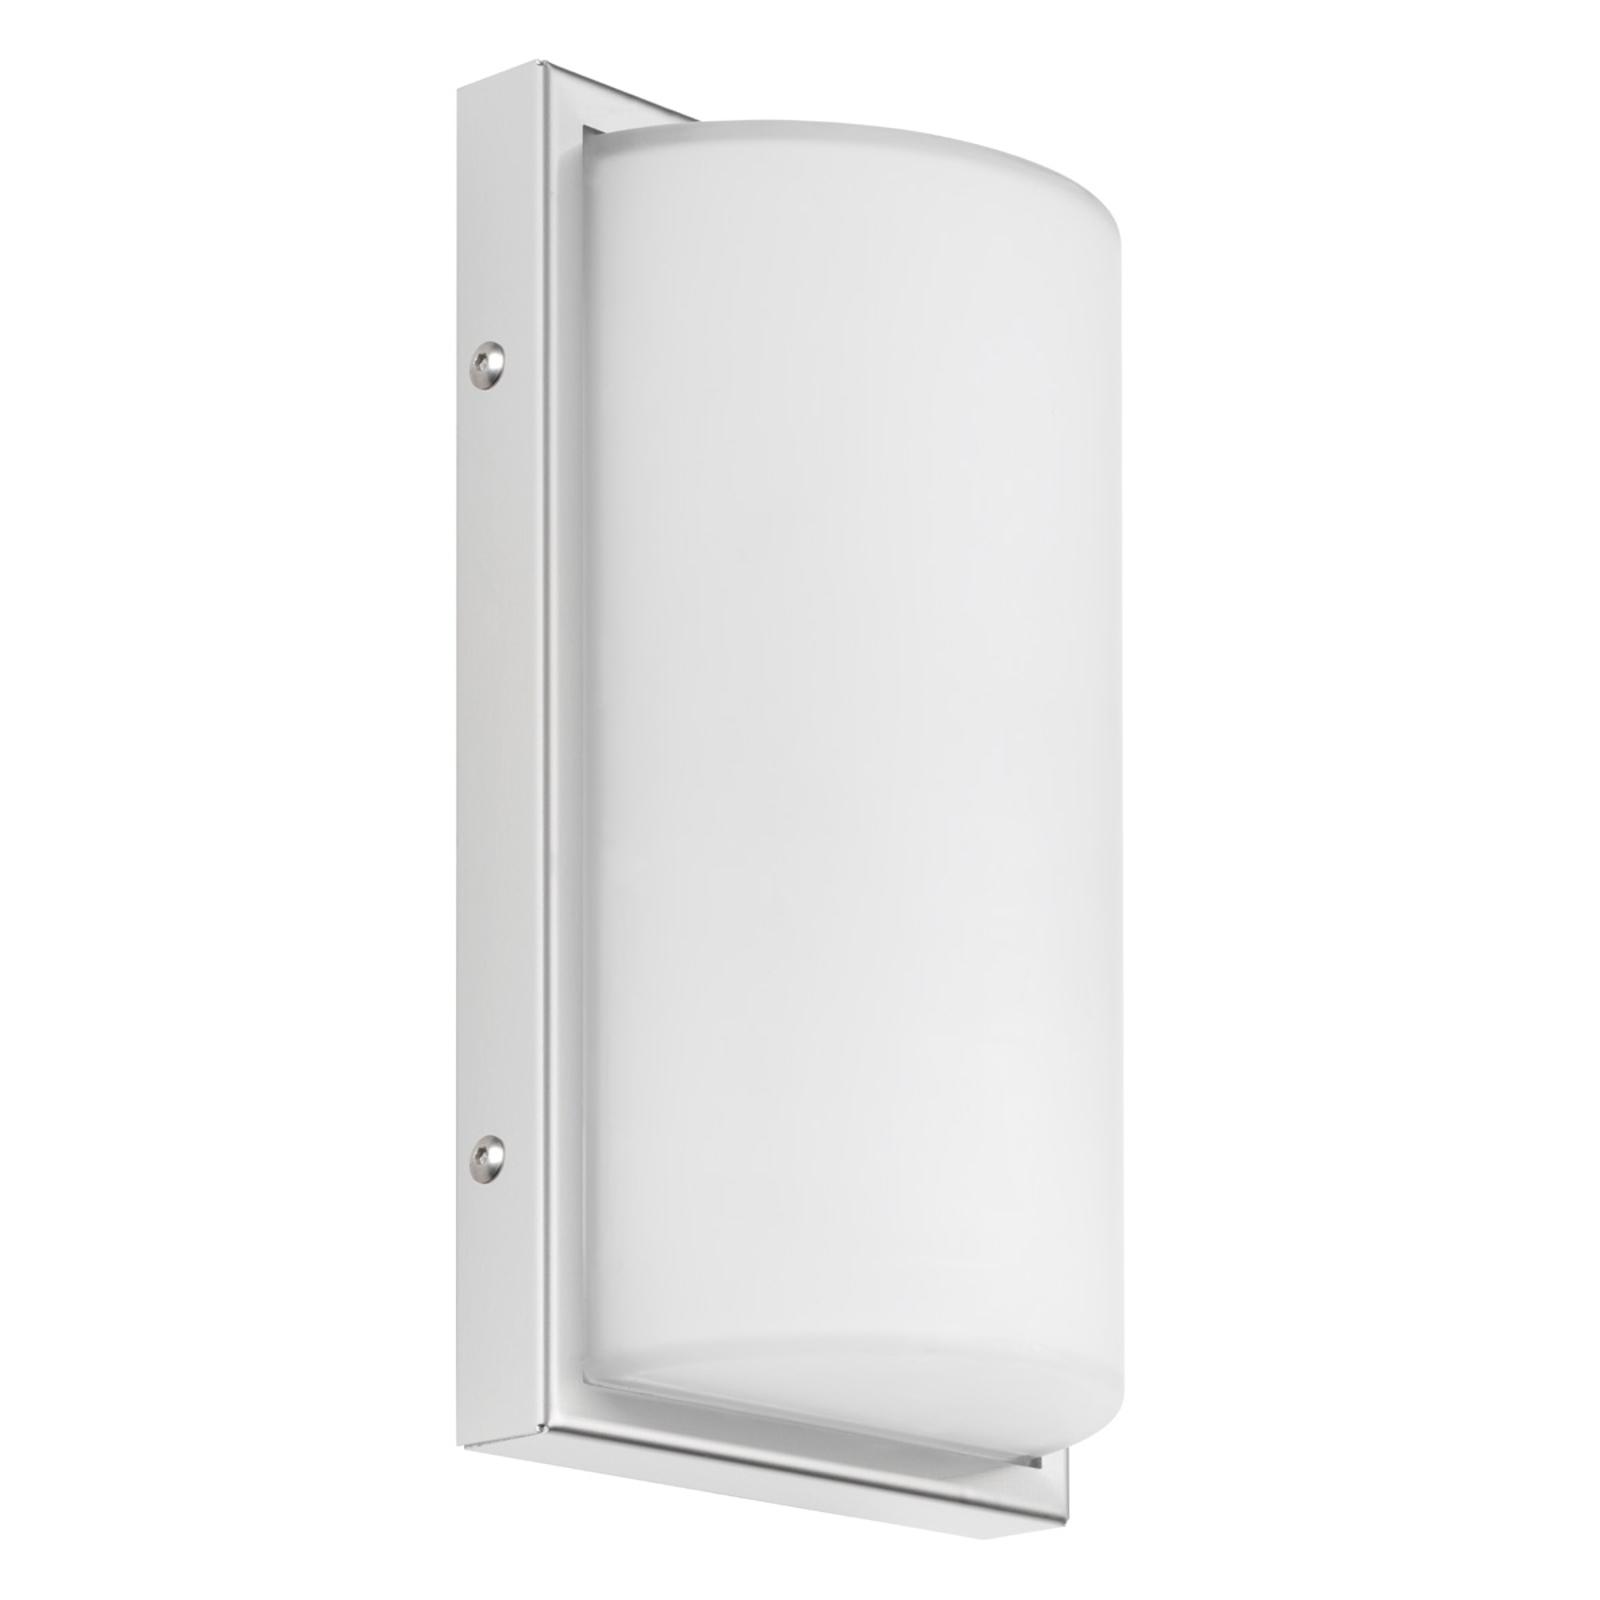 Applique da esterni LED 040, bianco